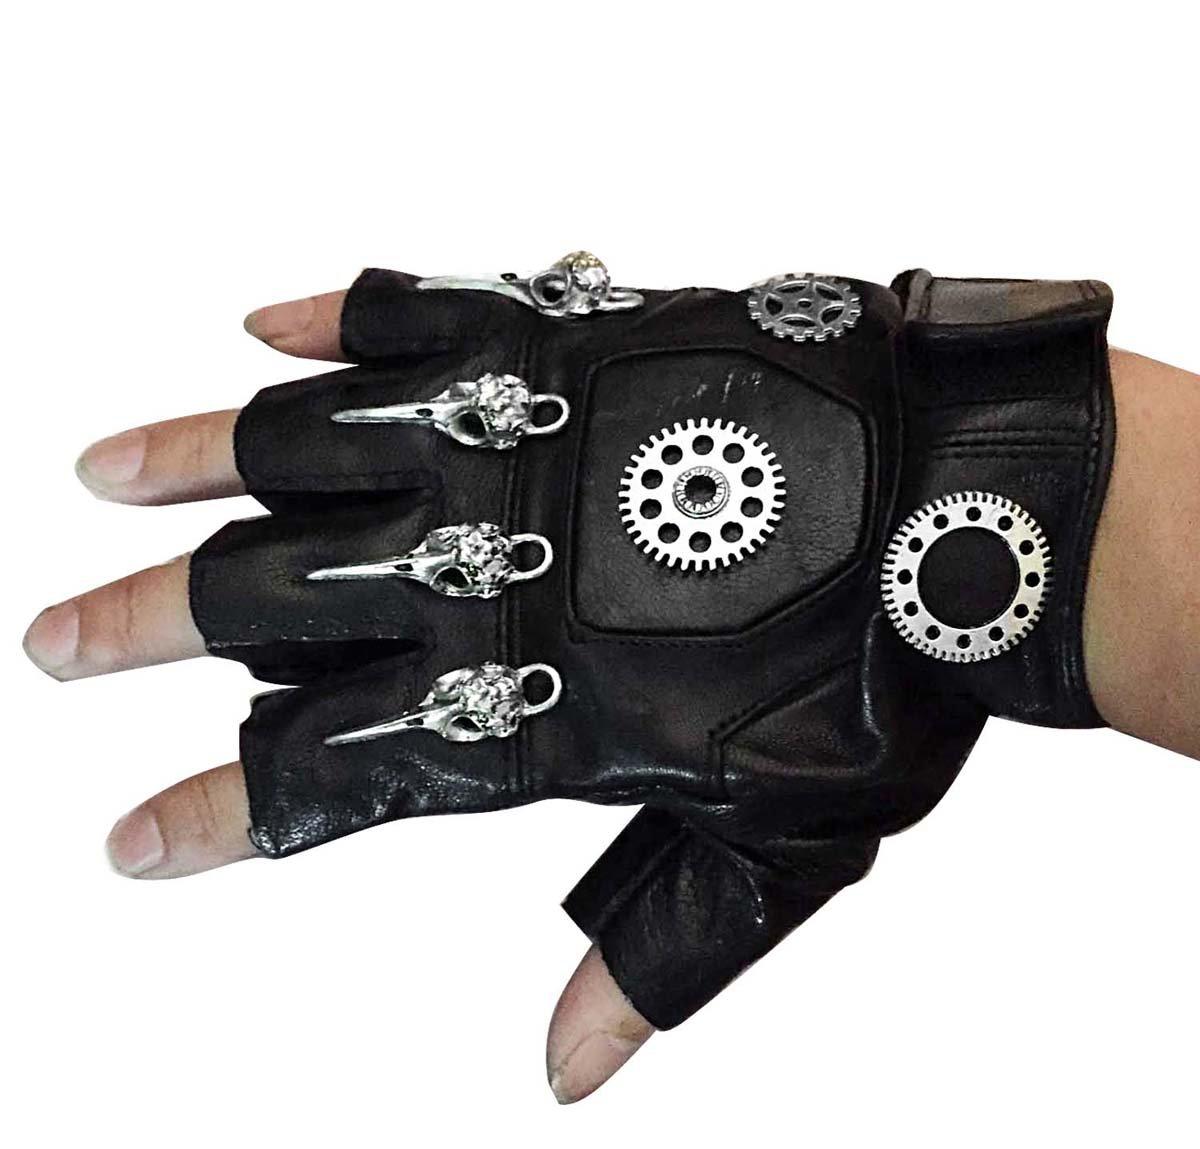 Mens Unisex Steampunk Gears Gothic Genuine Leather Half Finger Fingerless Gloves 2